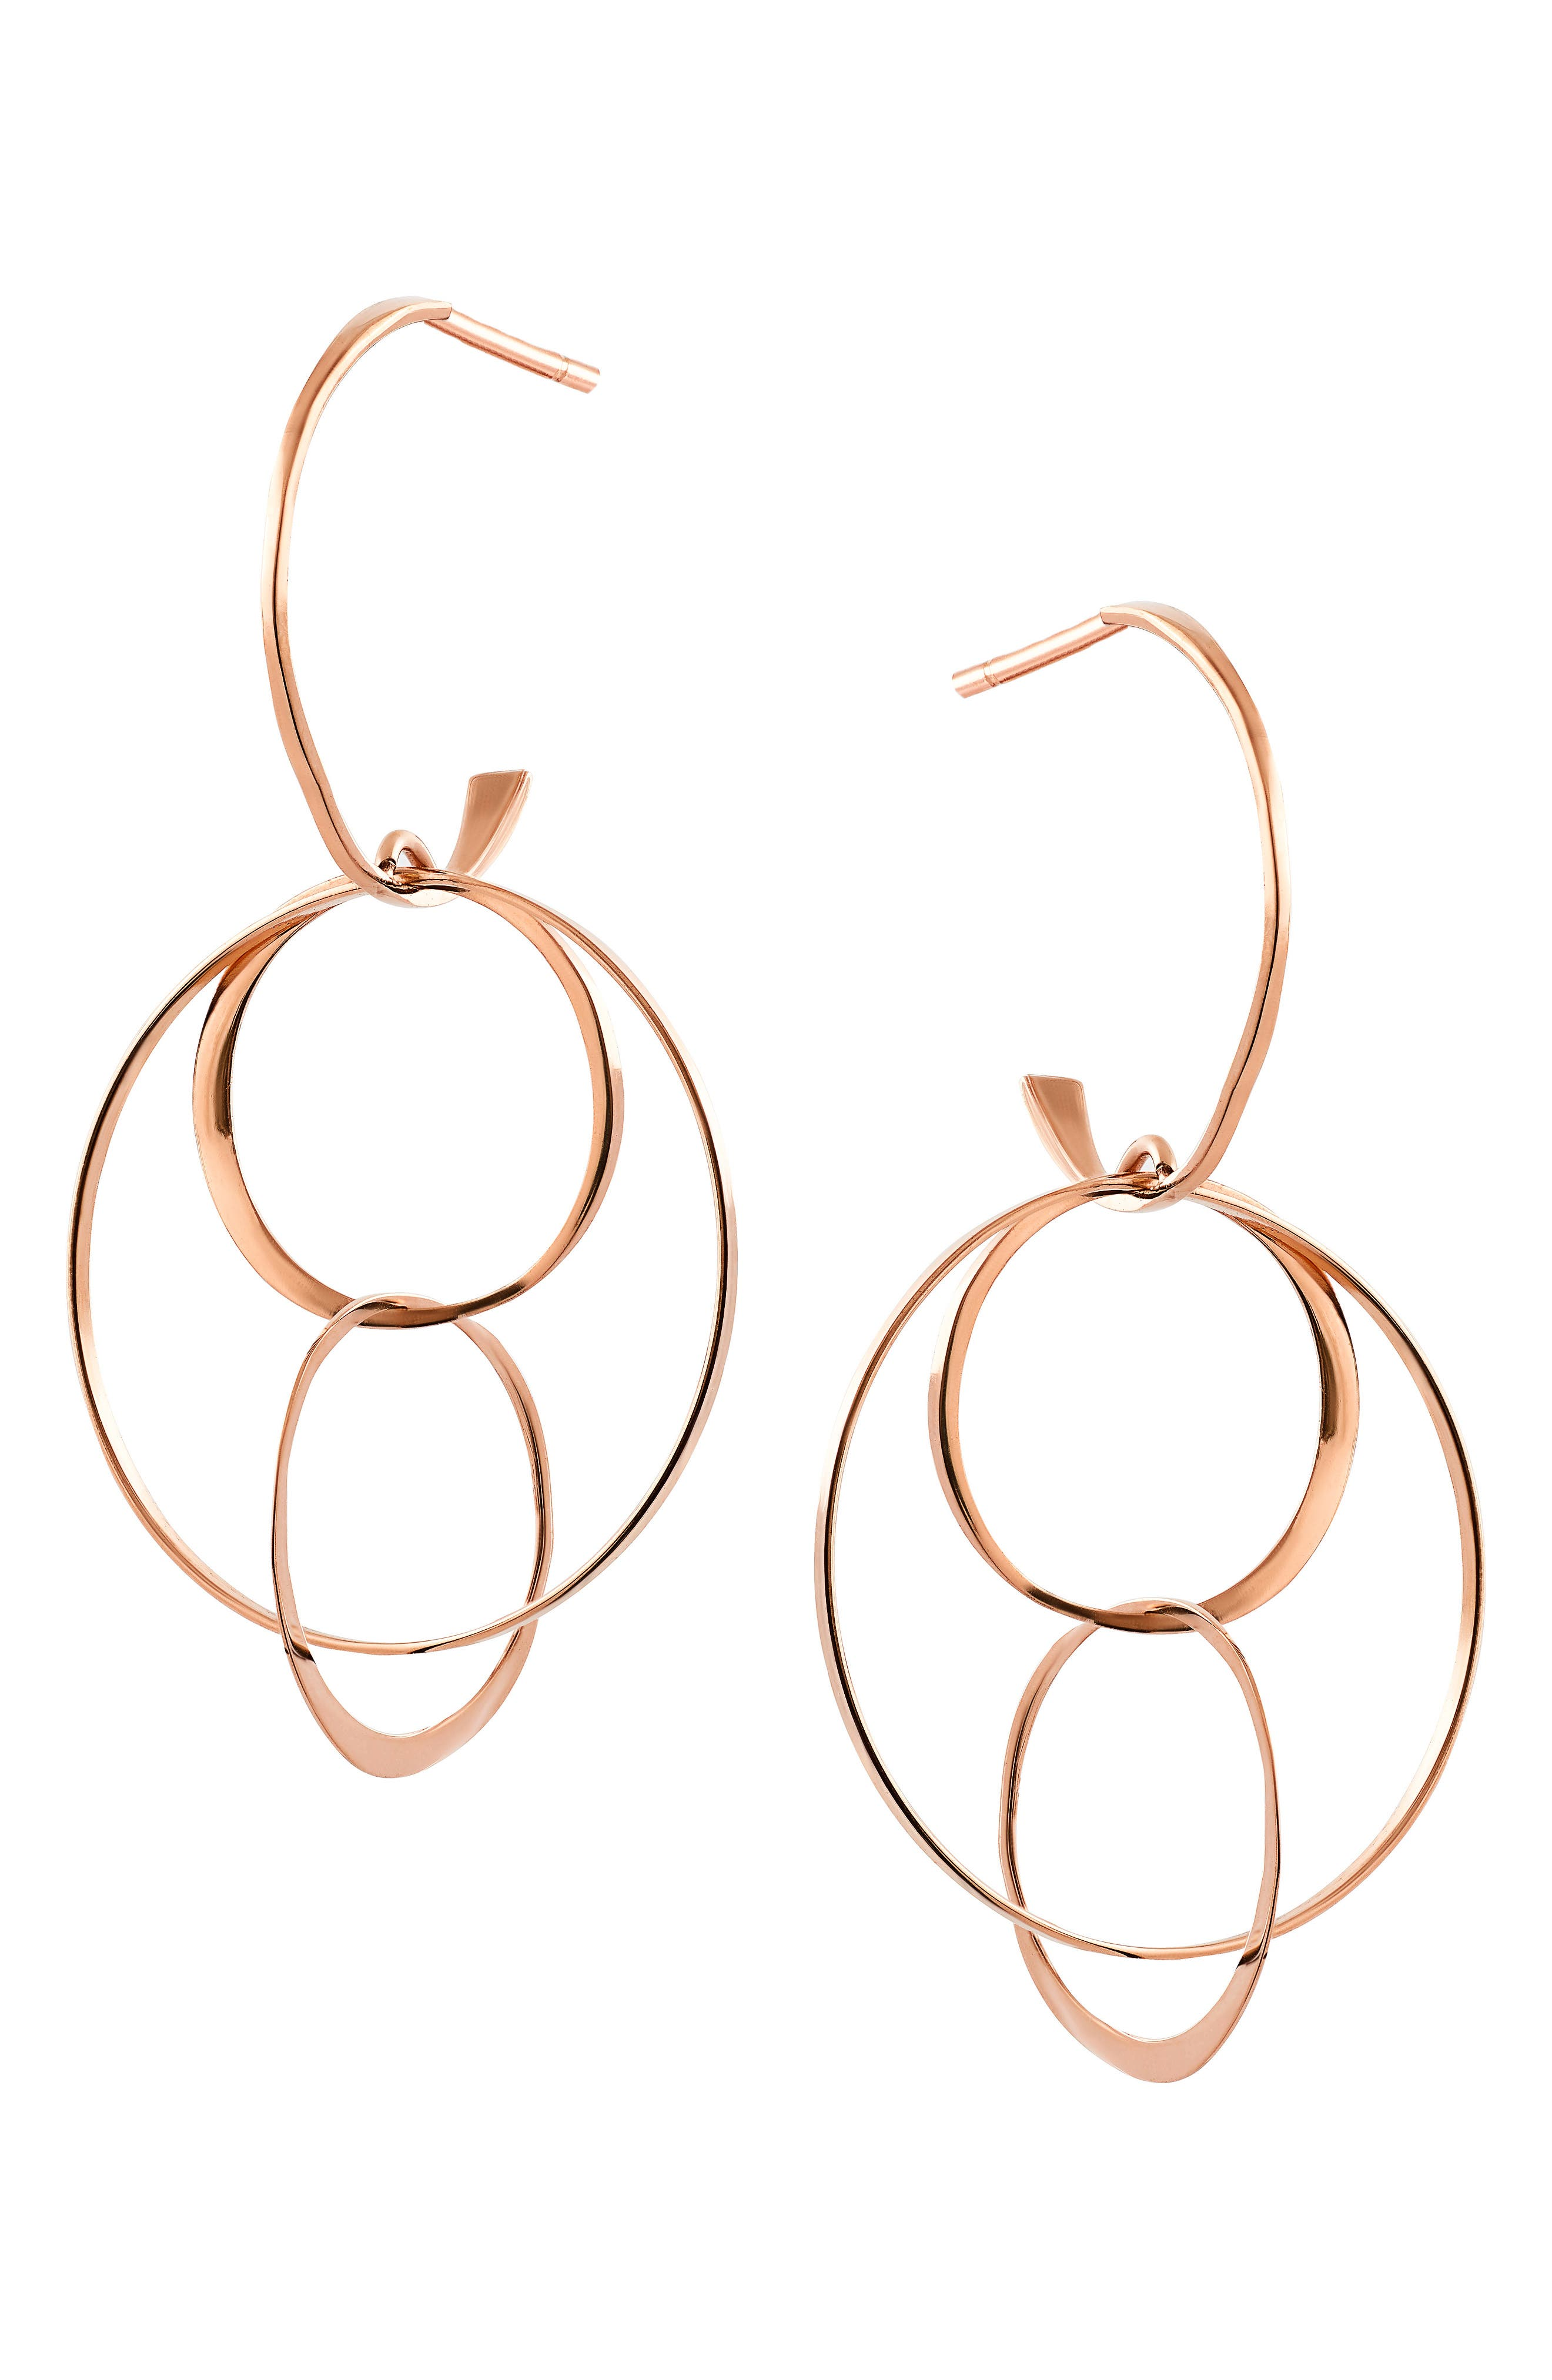 Main Image - Lana Jewelry Openwork Drop Earrings